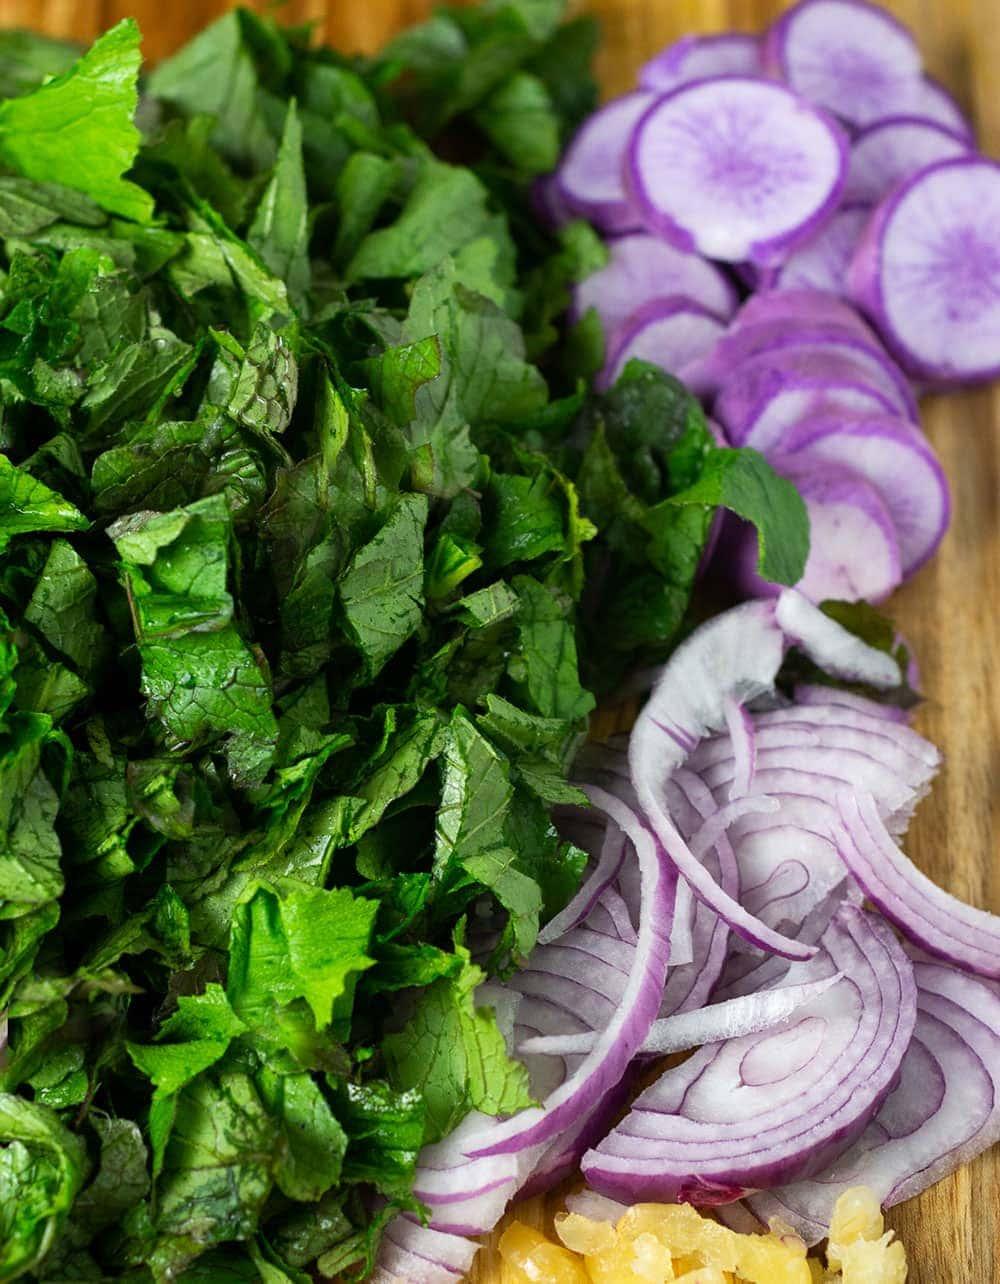 Chopped green radish leaves, purple radish slice